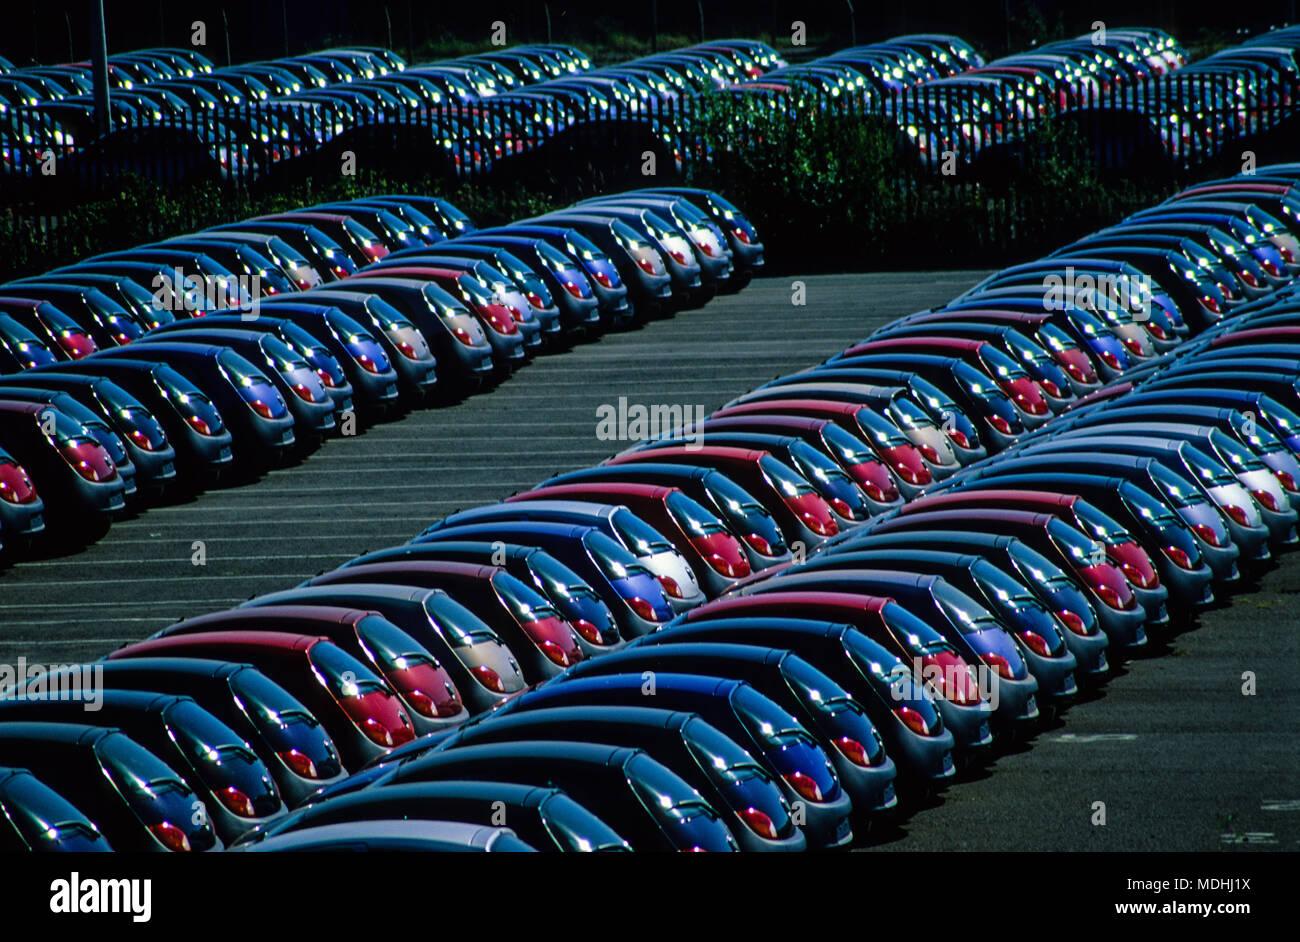 Car Storage, Southampton Docks, Southampton, Hampshire, England, UK, GB. - Stock Image